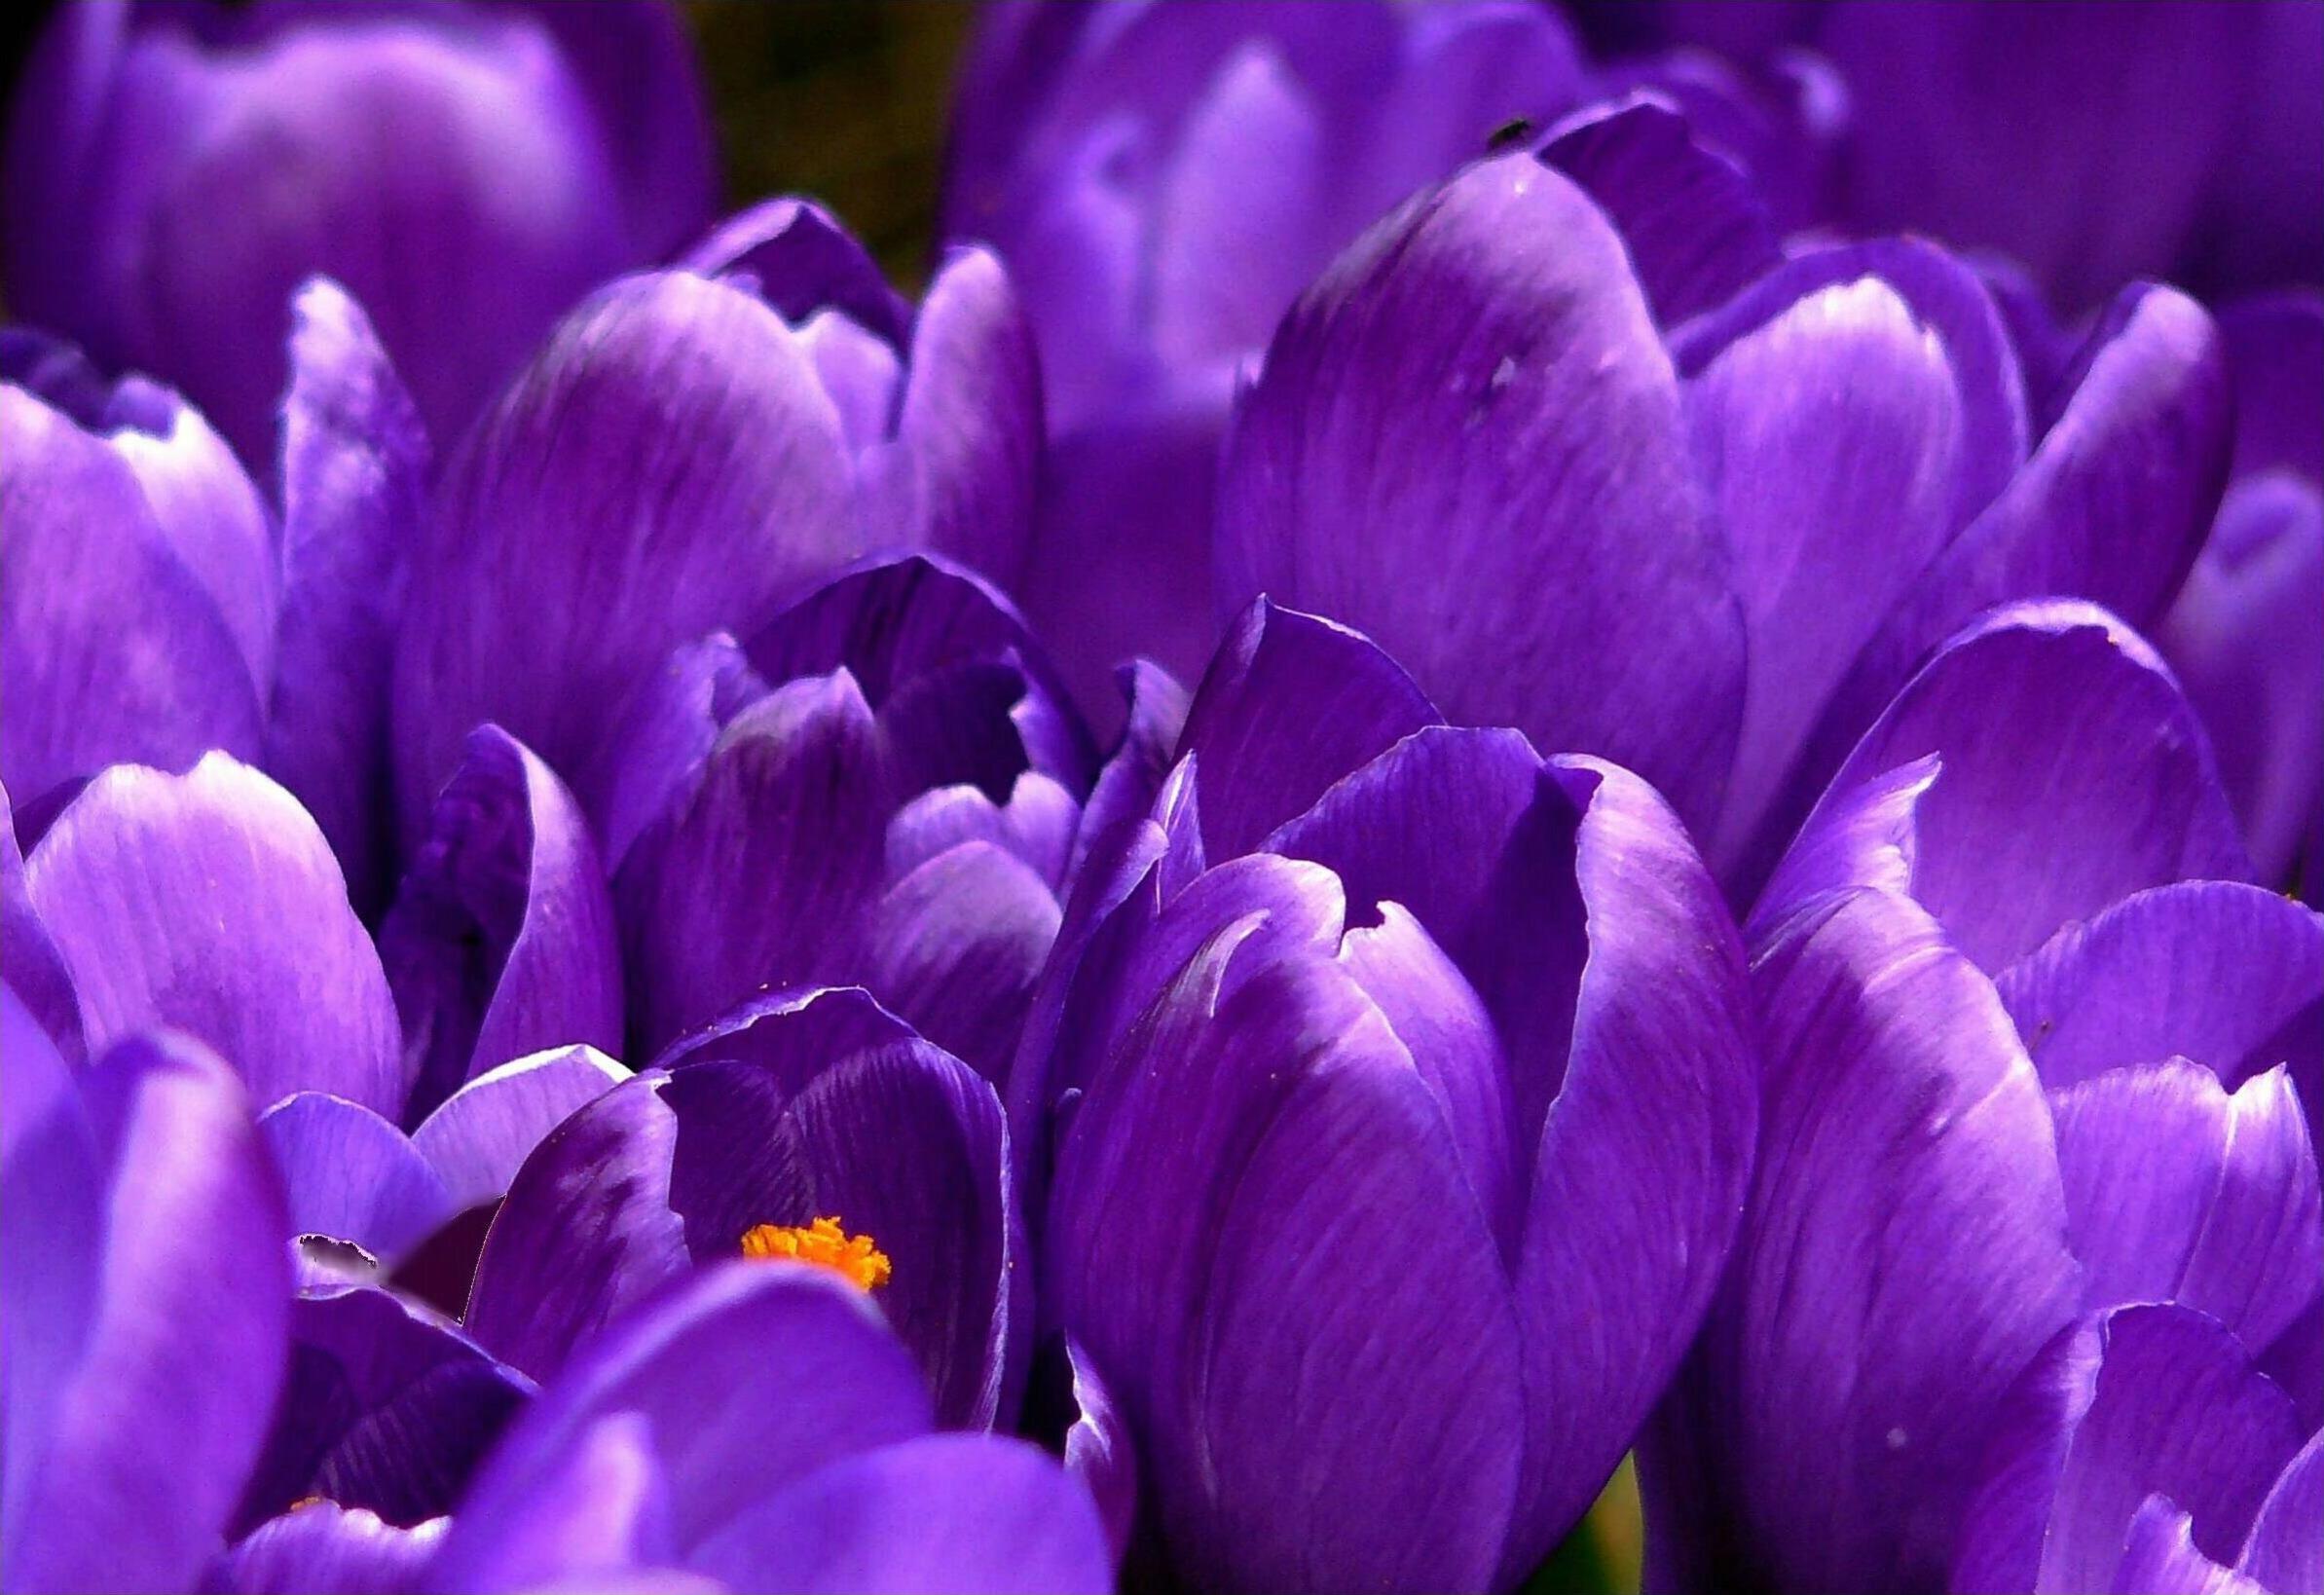 free stock photos of purple flower · pexels, Beautiful flower